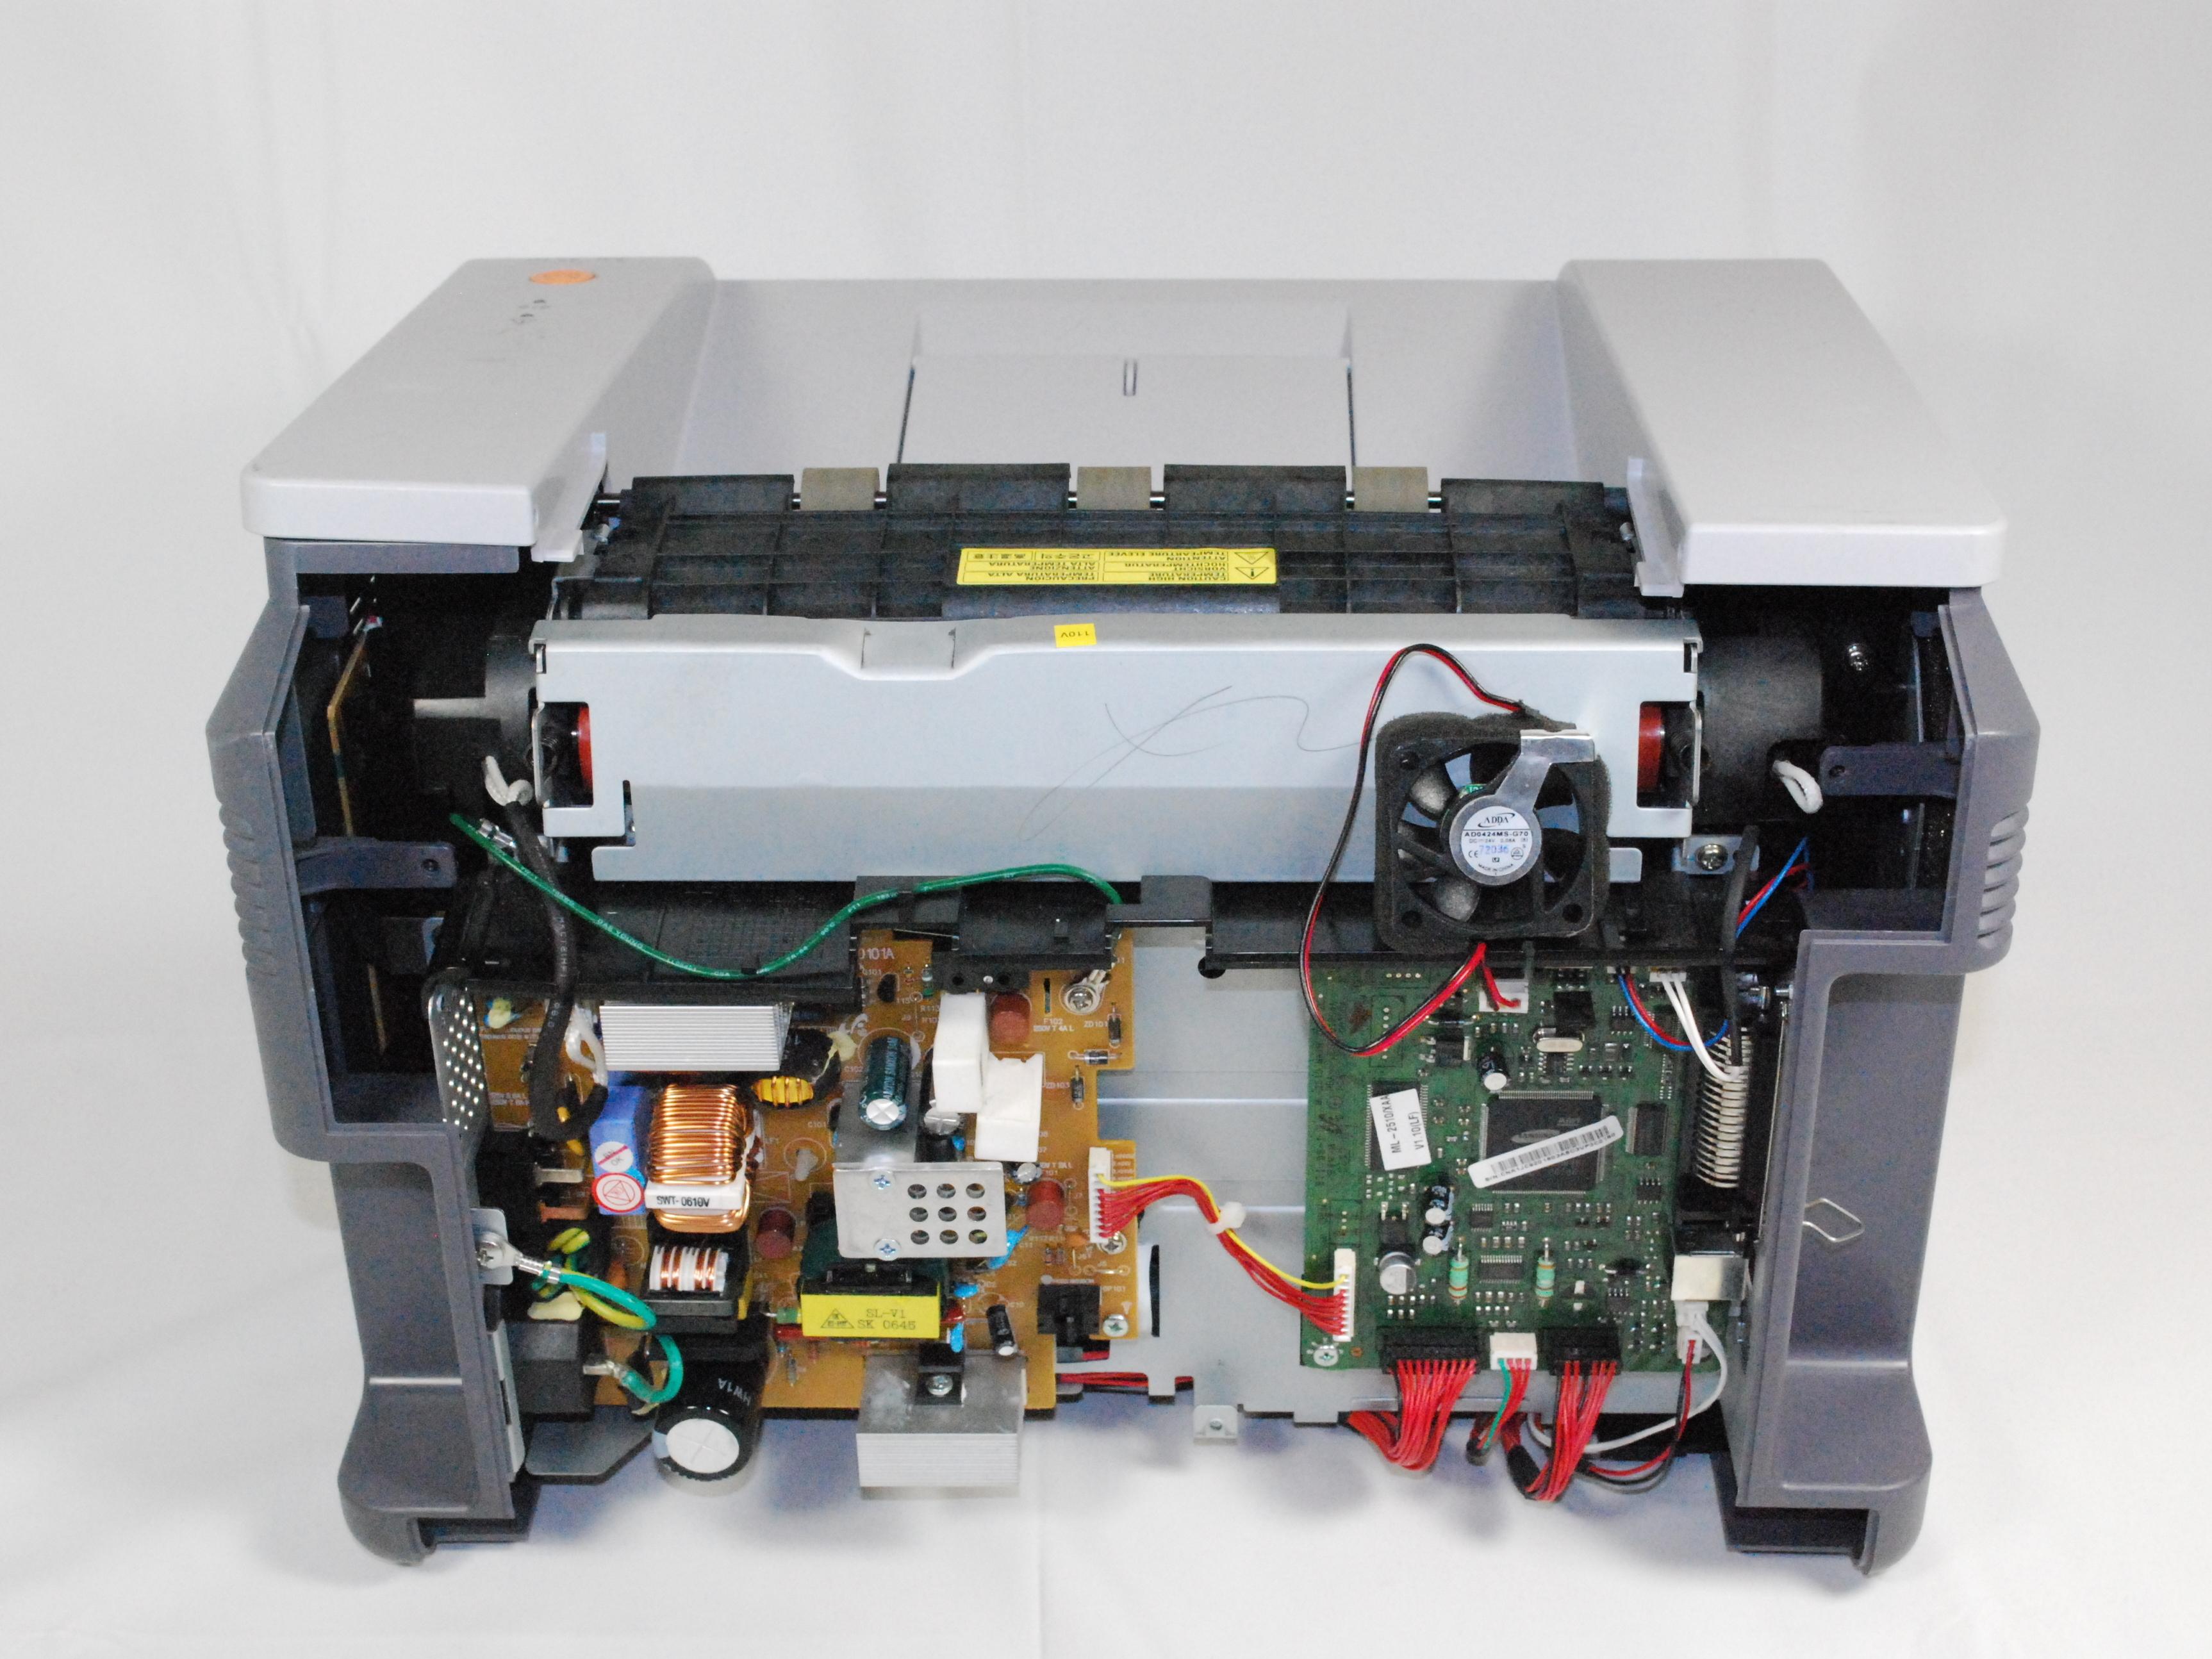 Download free pdf for samsung ml-2510 printer manual.